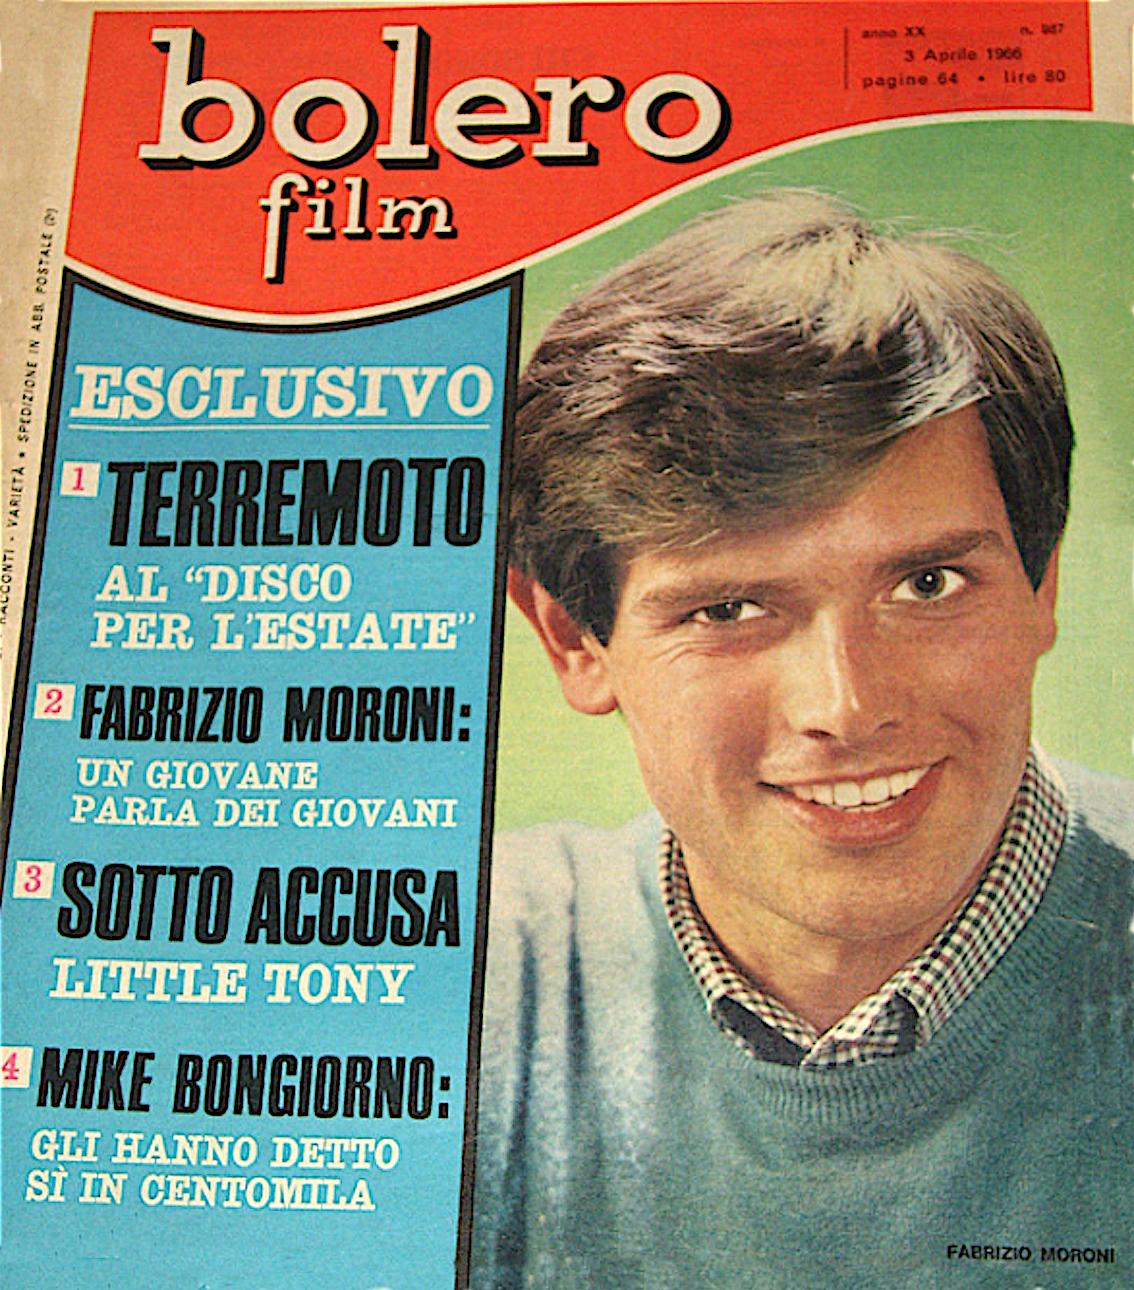 Fabrizio Moroni